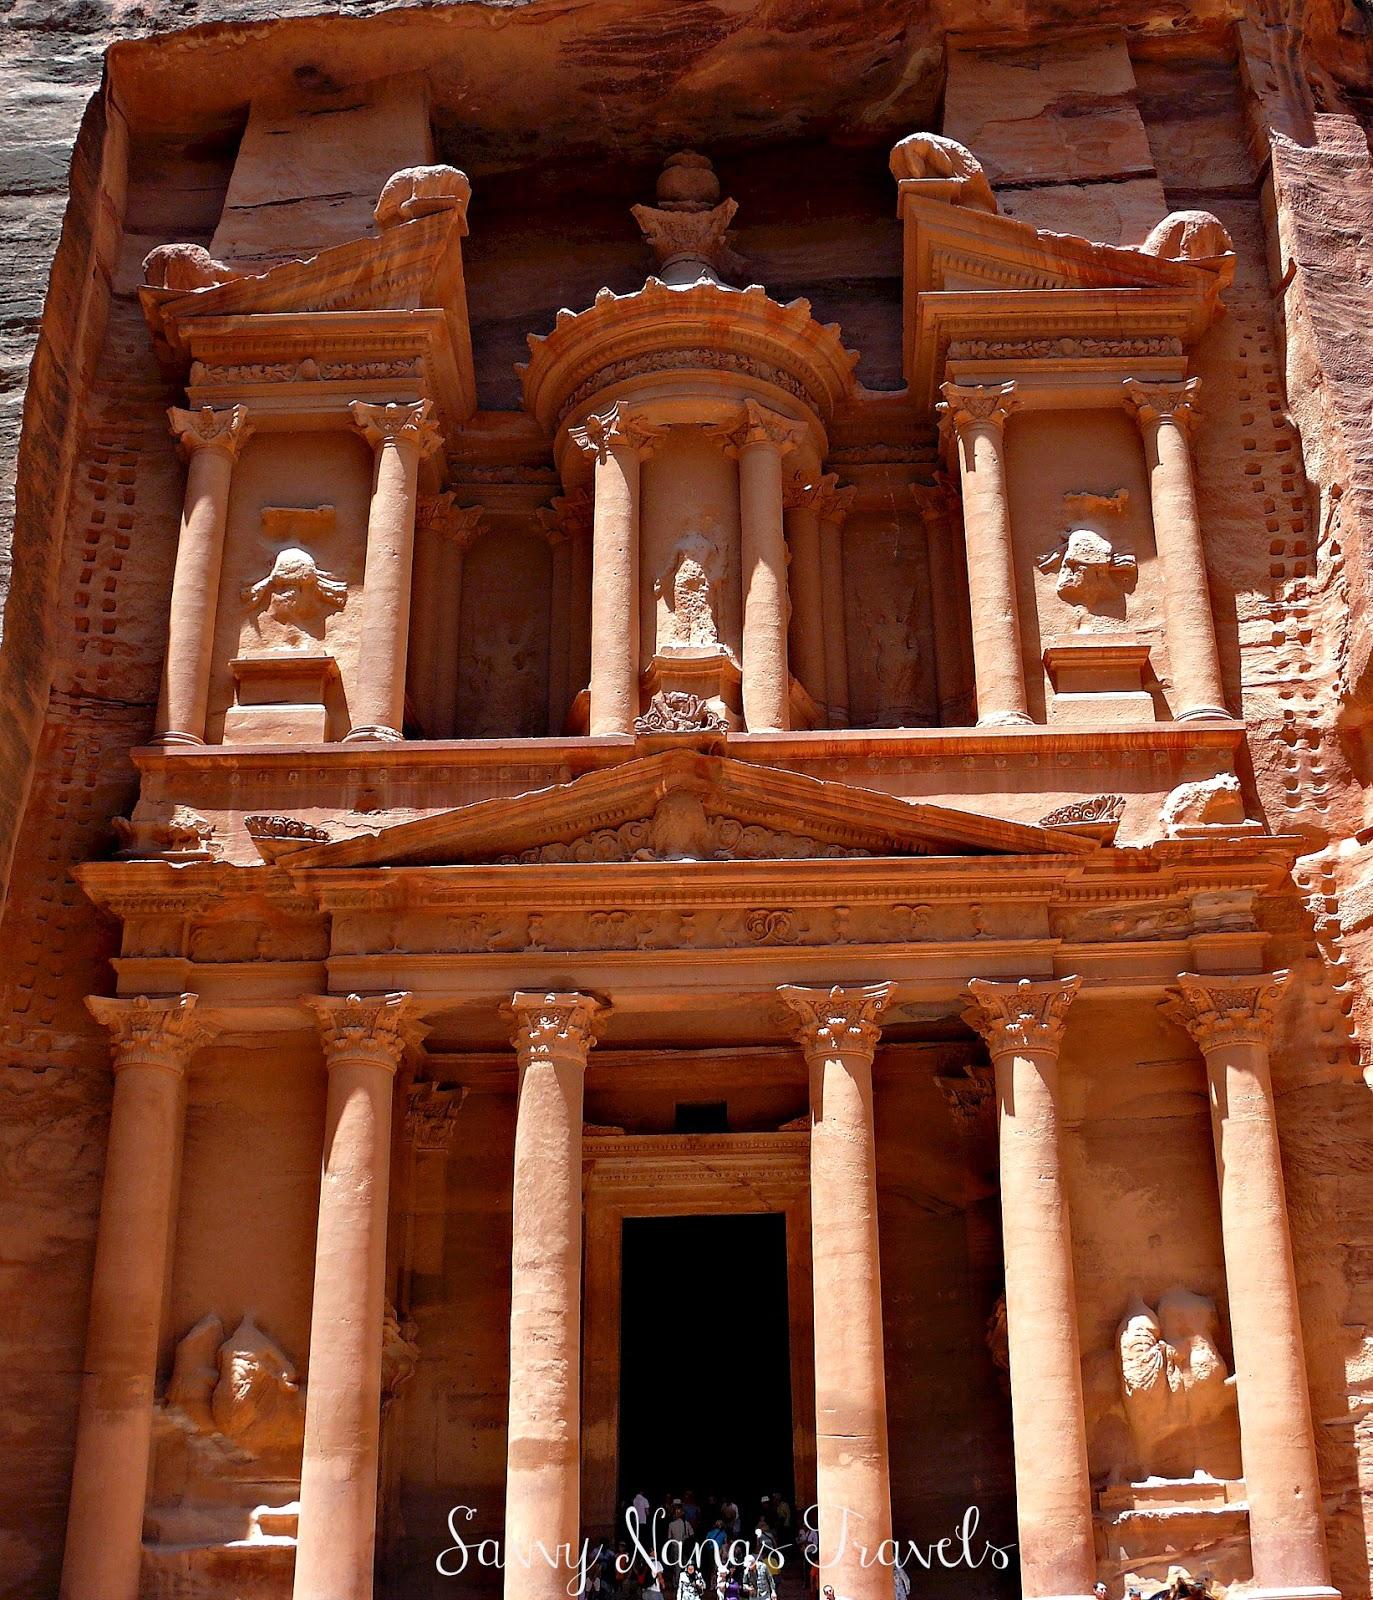 Must See Highlights of Petra, Jordan